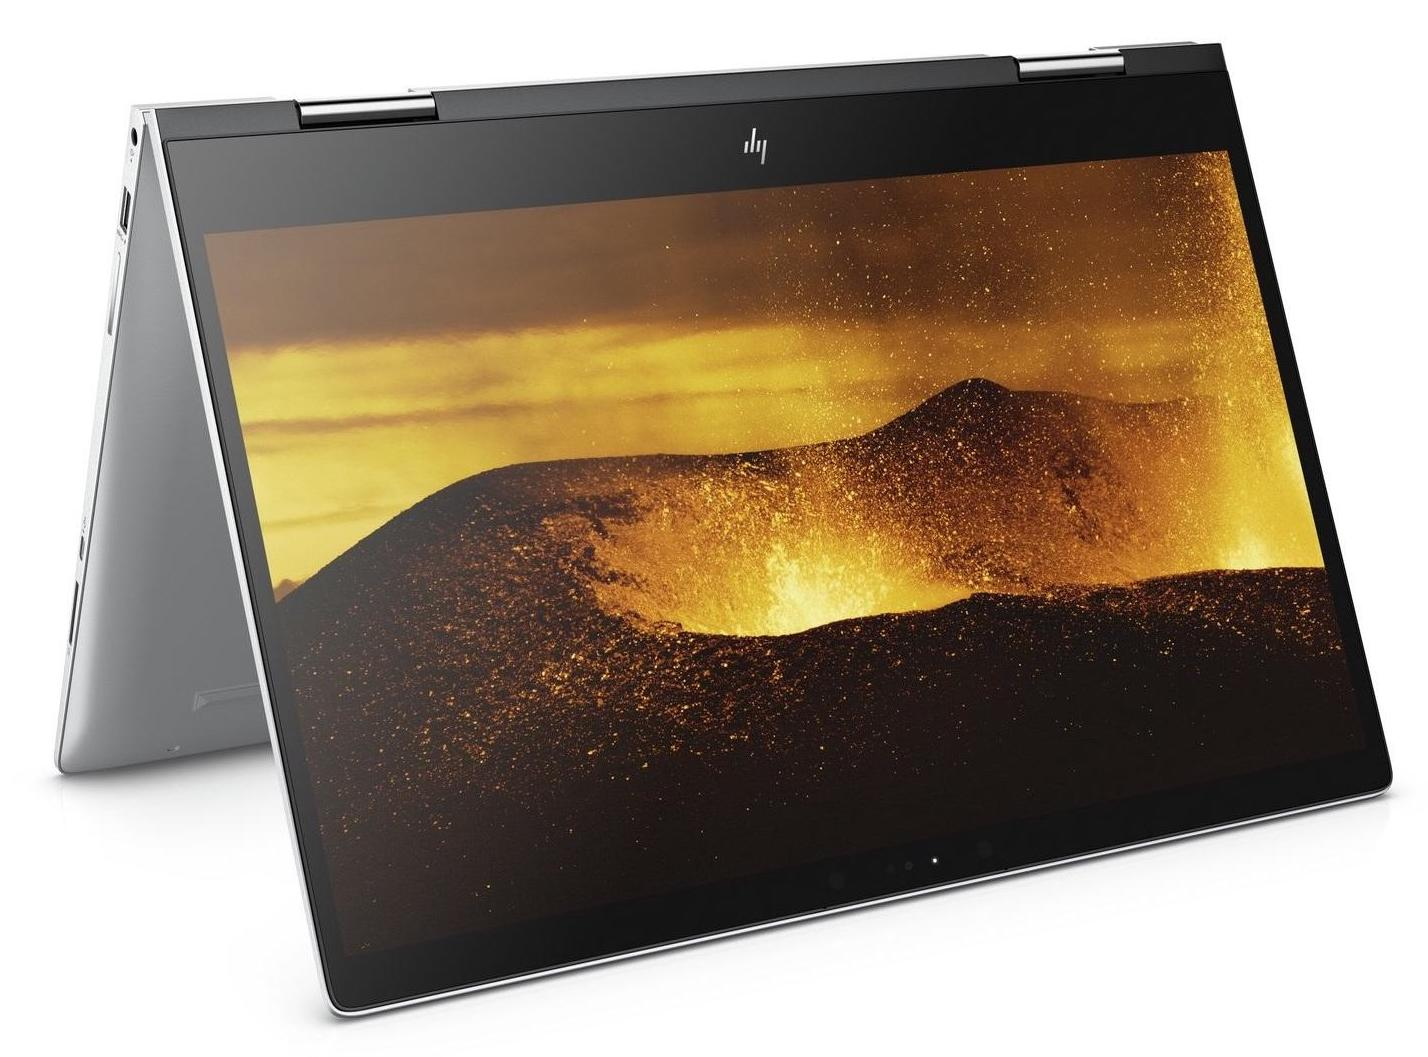 HP Envy x360 15-bp005nf, ultrabook 15 pouces tablette IPS i5 SSD (879€)